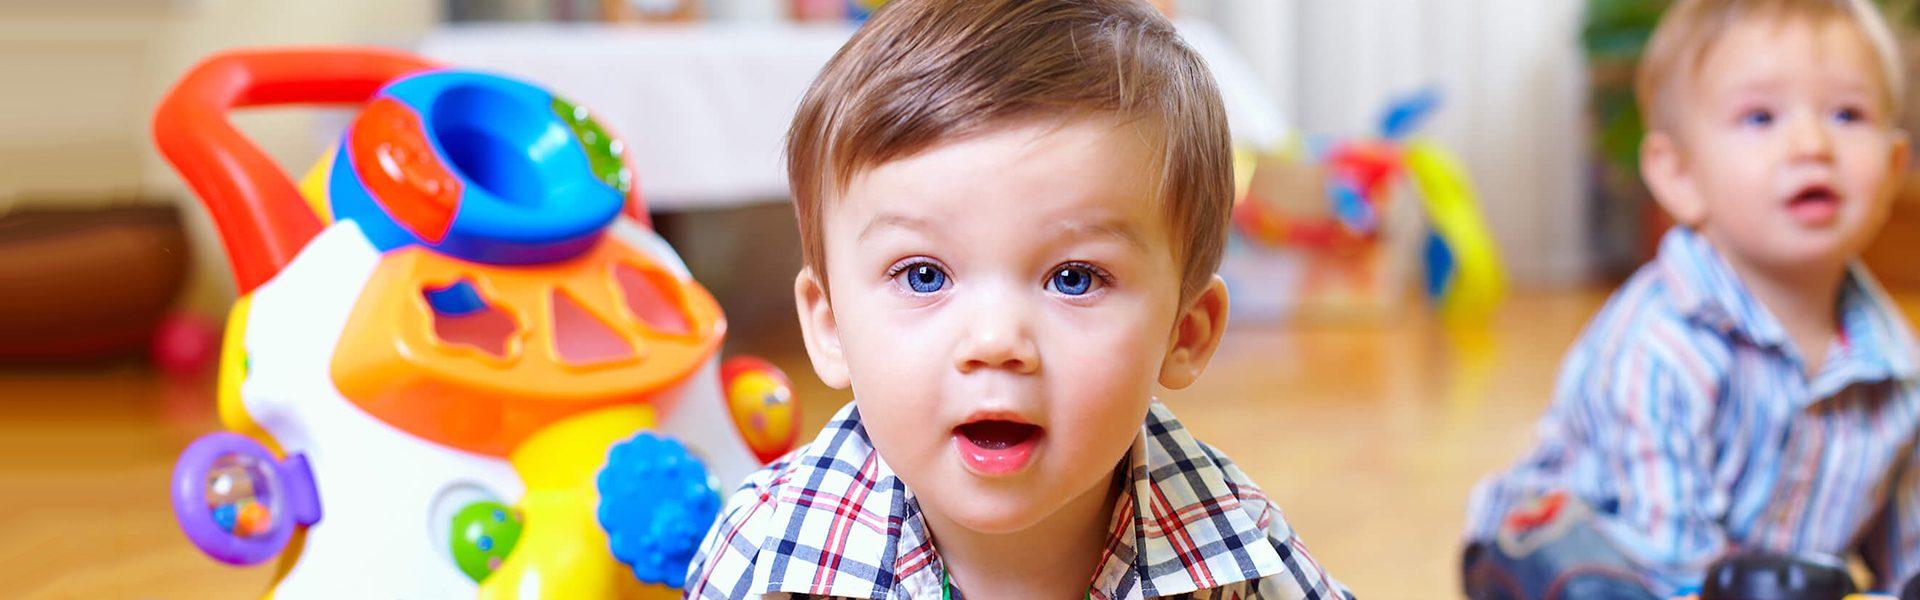 When Should Your Child Start Montessori Training?